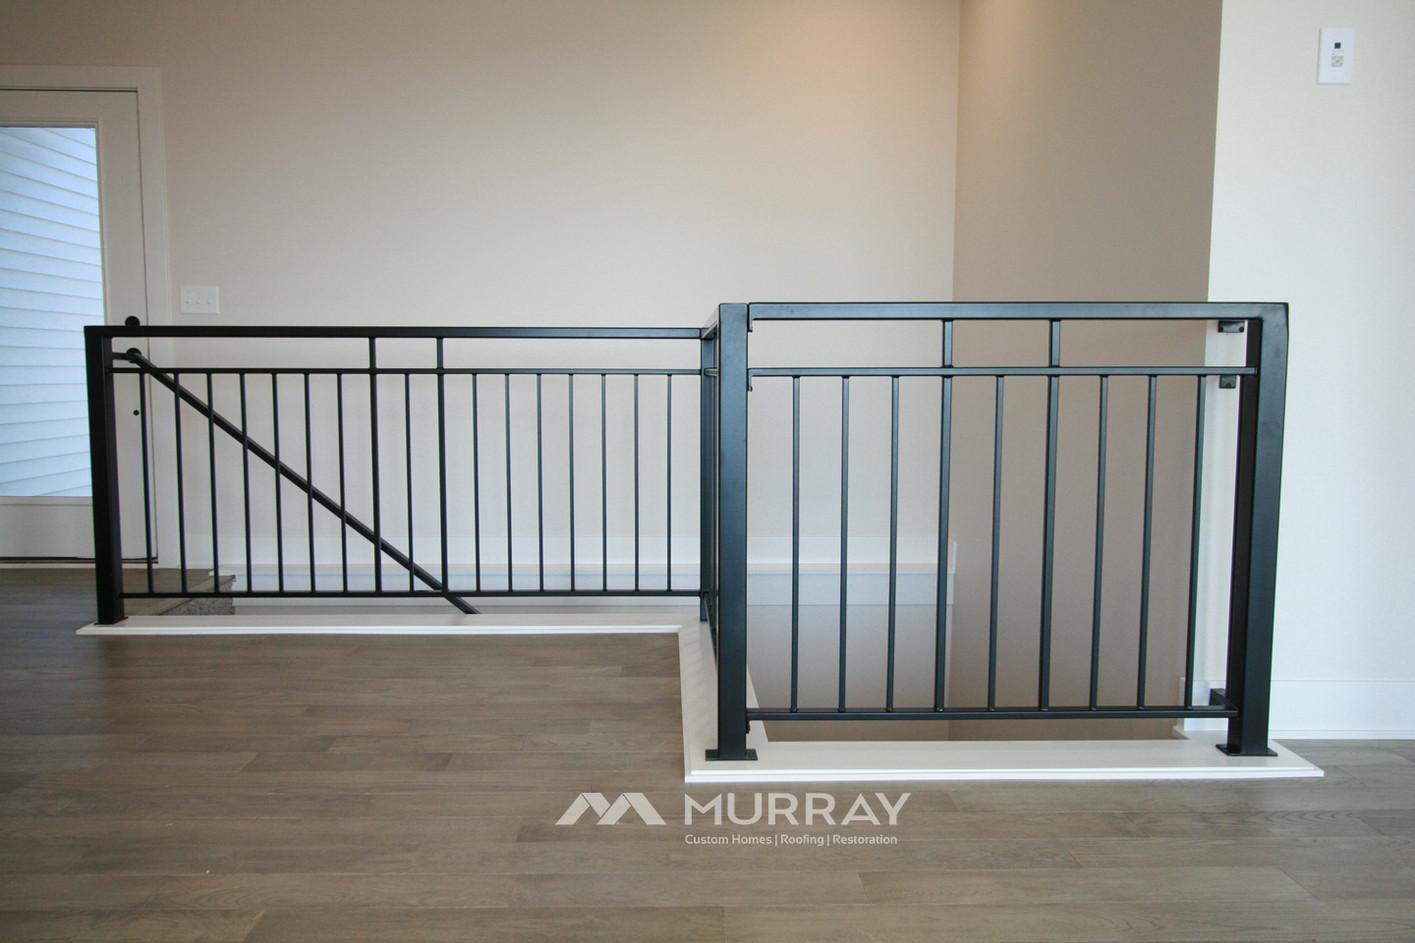 Murray Custom Home Builders Gallery SW Village Heights 6525 Stairwell Railling2